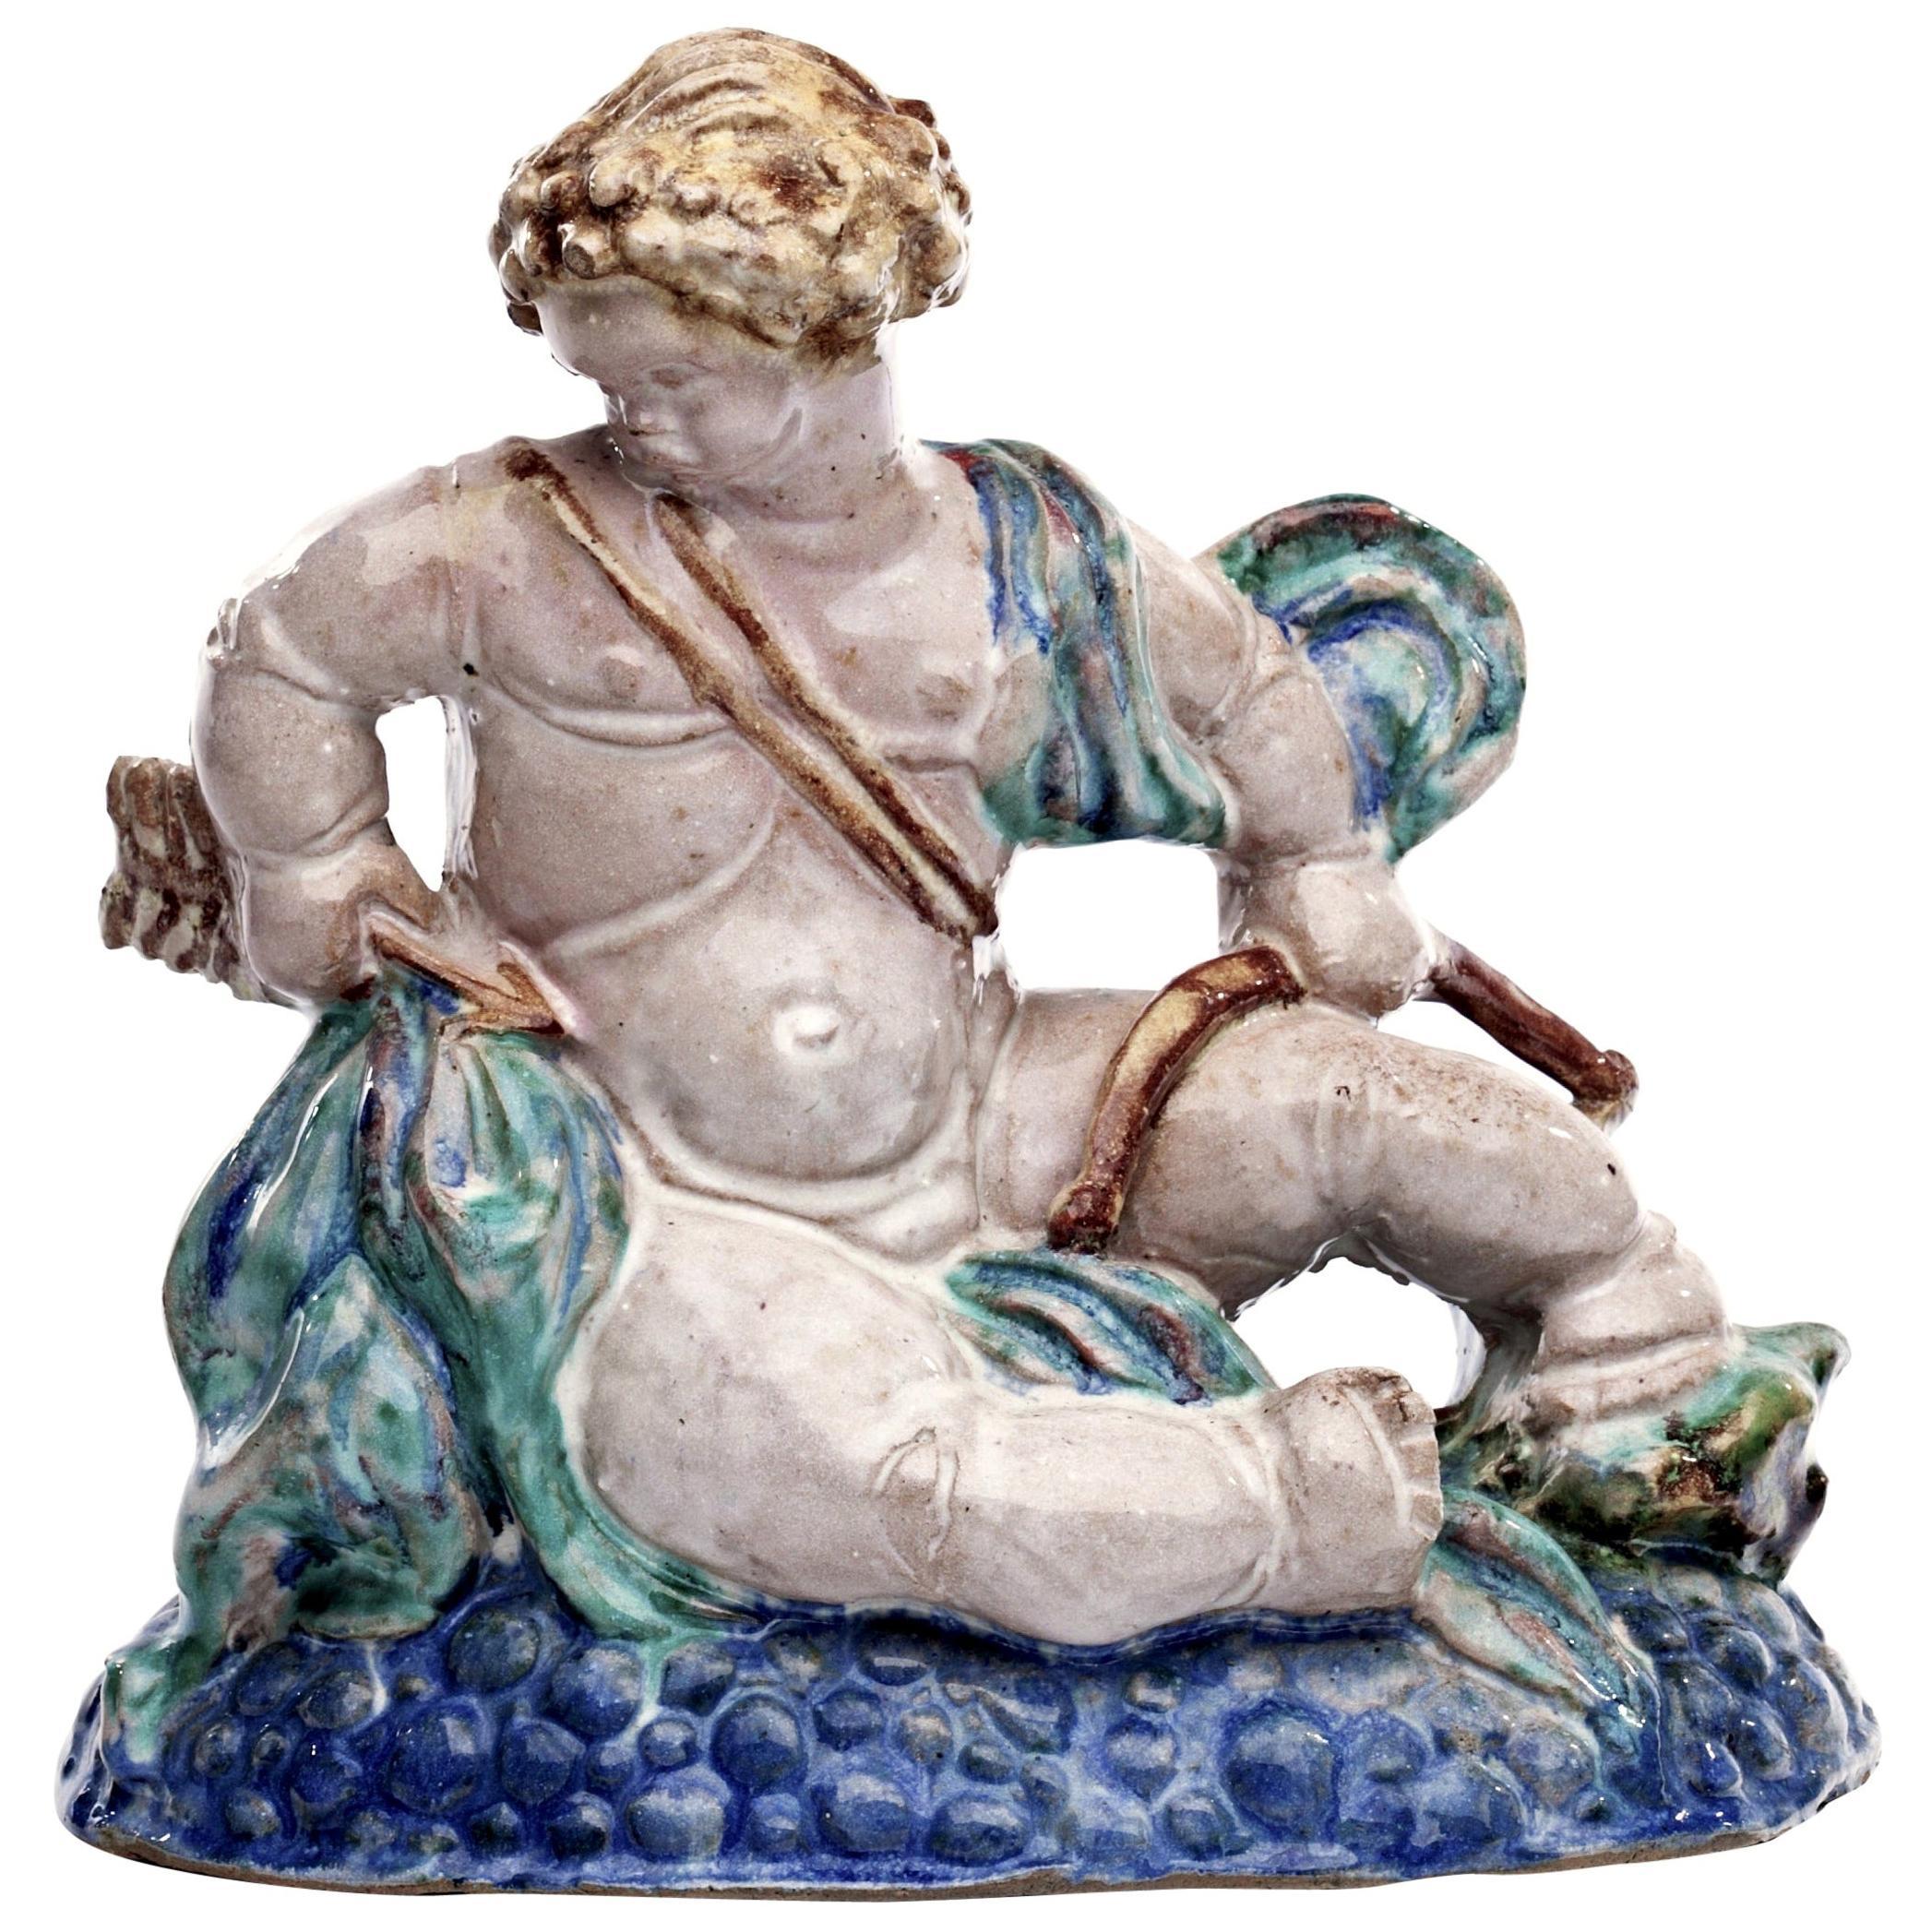 Michael Powolny Style Putto or Putti Ceramic Sculpture